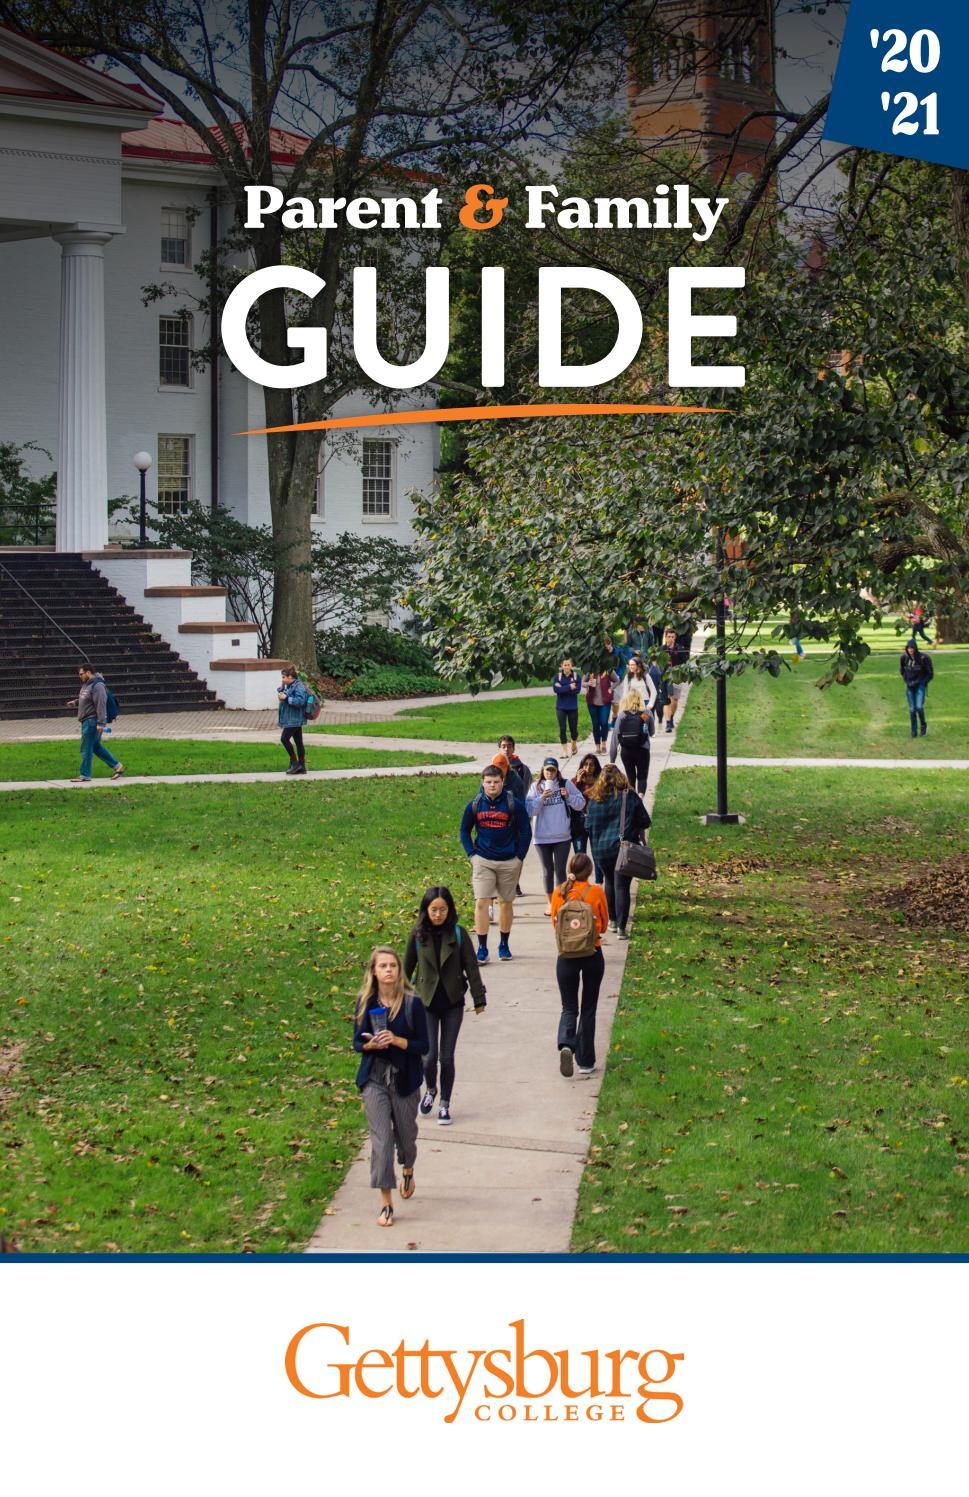 Gettysburg College Academic Calendar 2021-22 Gettysburg College Parent & Family guide by CollegiateParent   issuu